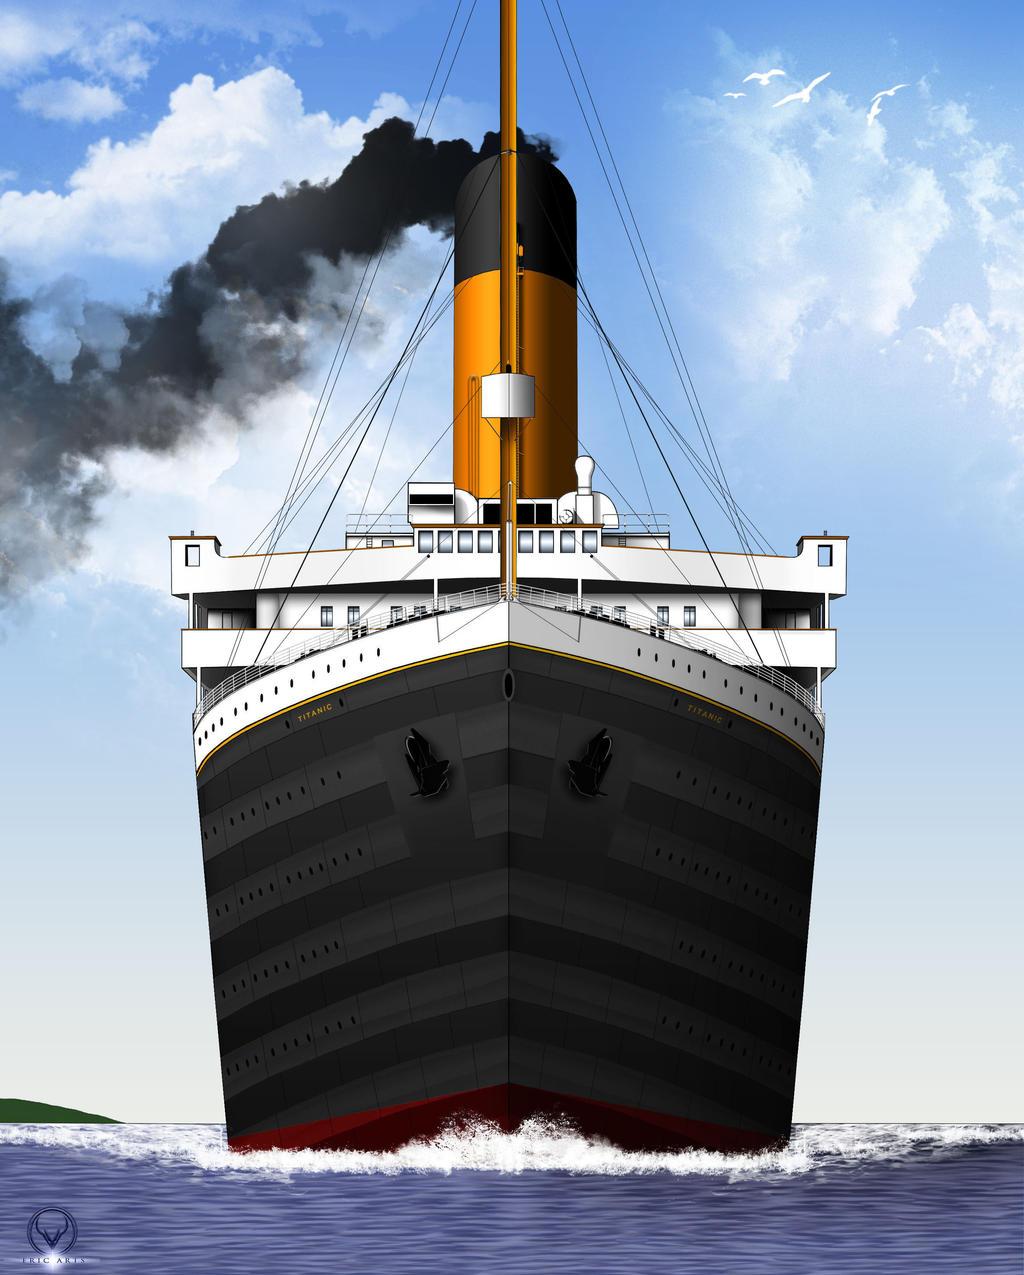 Titanic Wallpaper: TITANIC SETS SAIL Updated By ERIC-ARTS-inc On DeviantArt